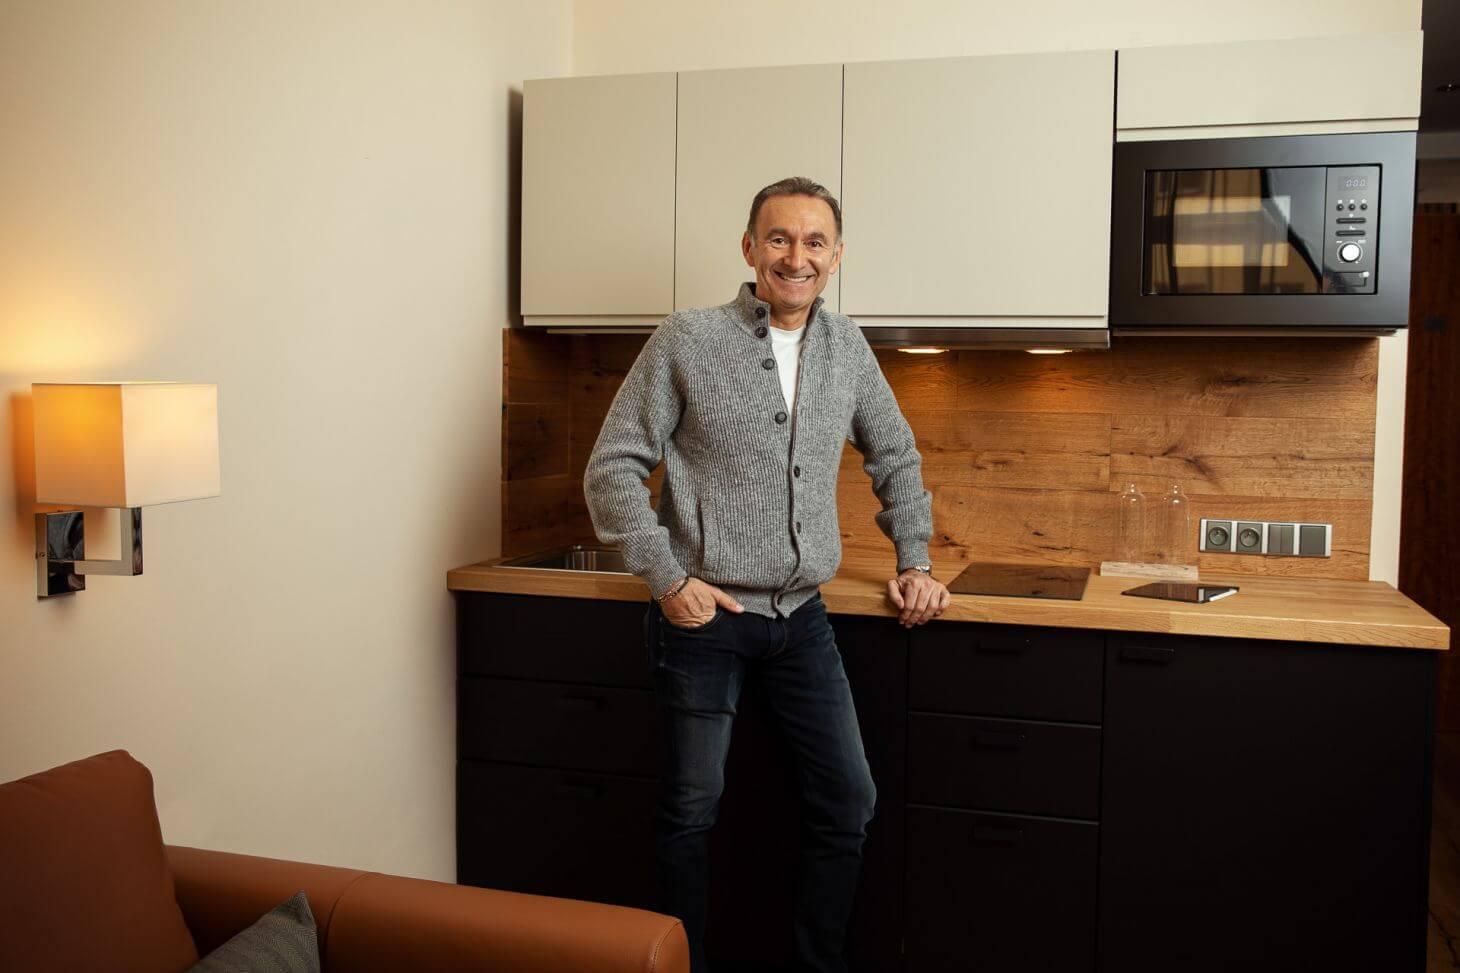 Lubomir Silhavy Zakladatel Worklounge